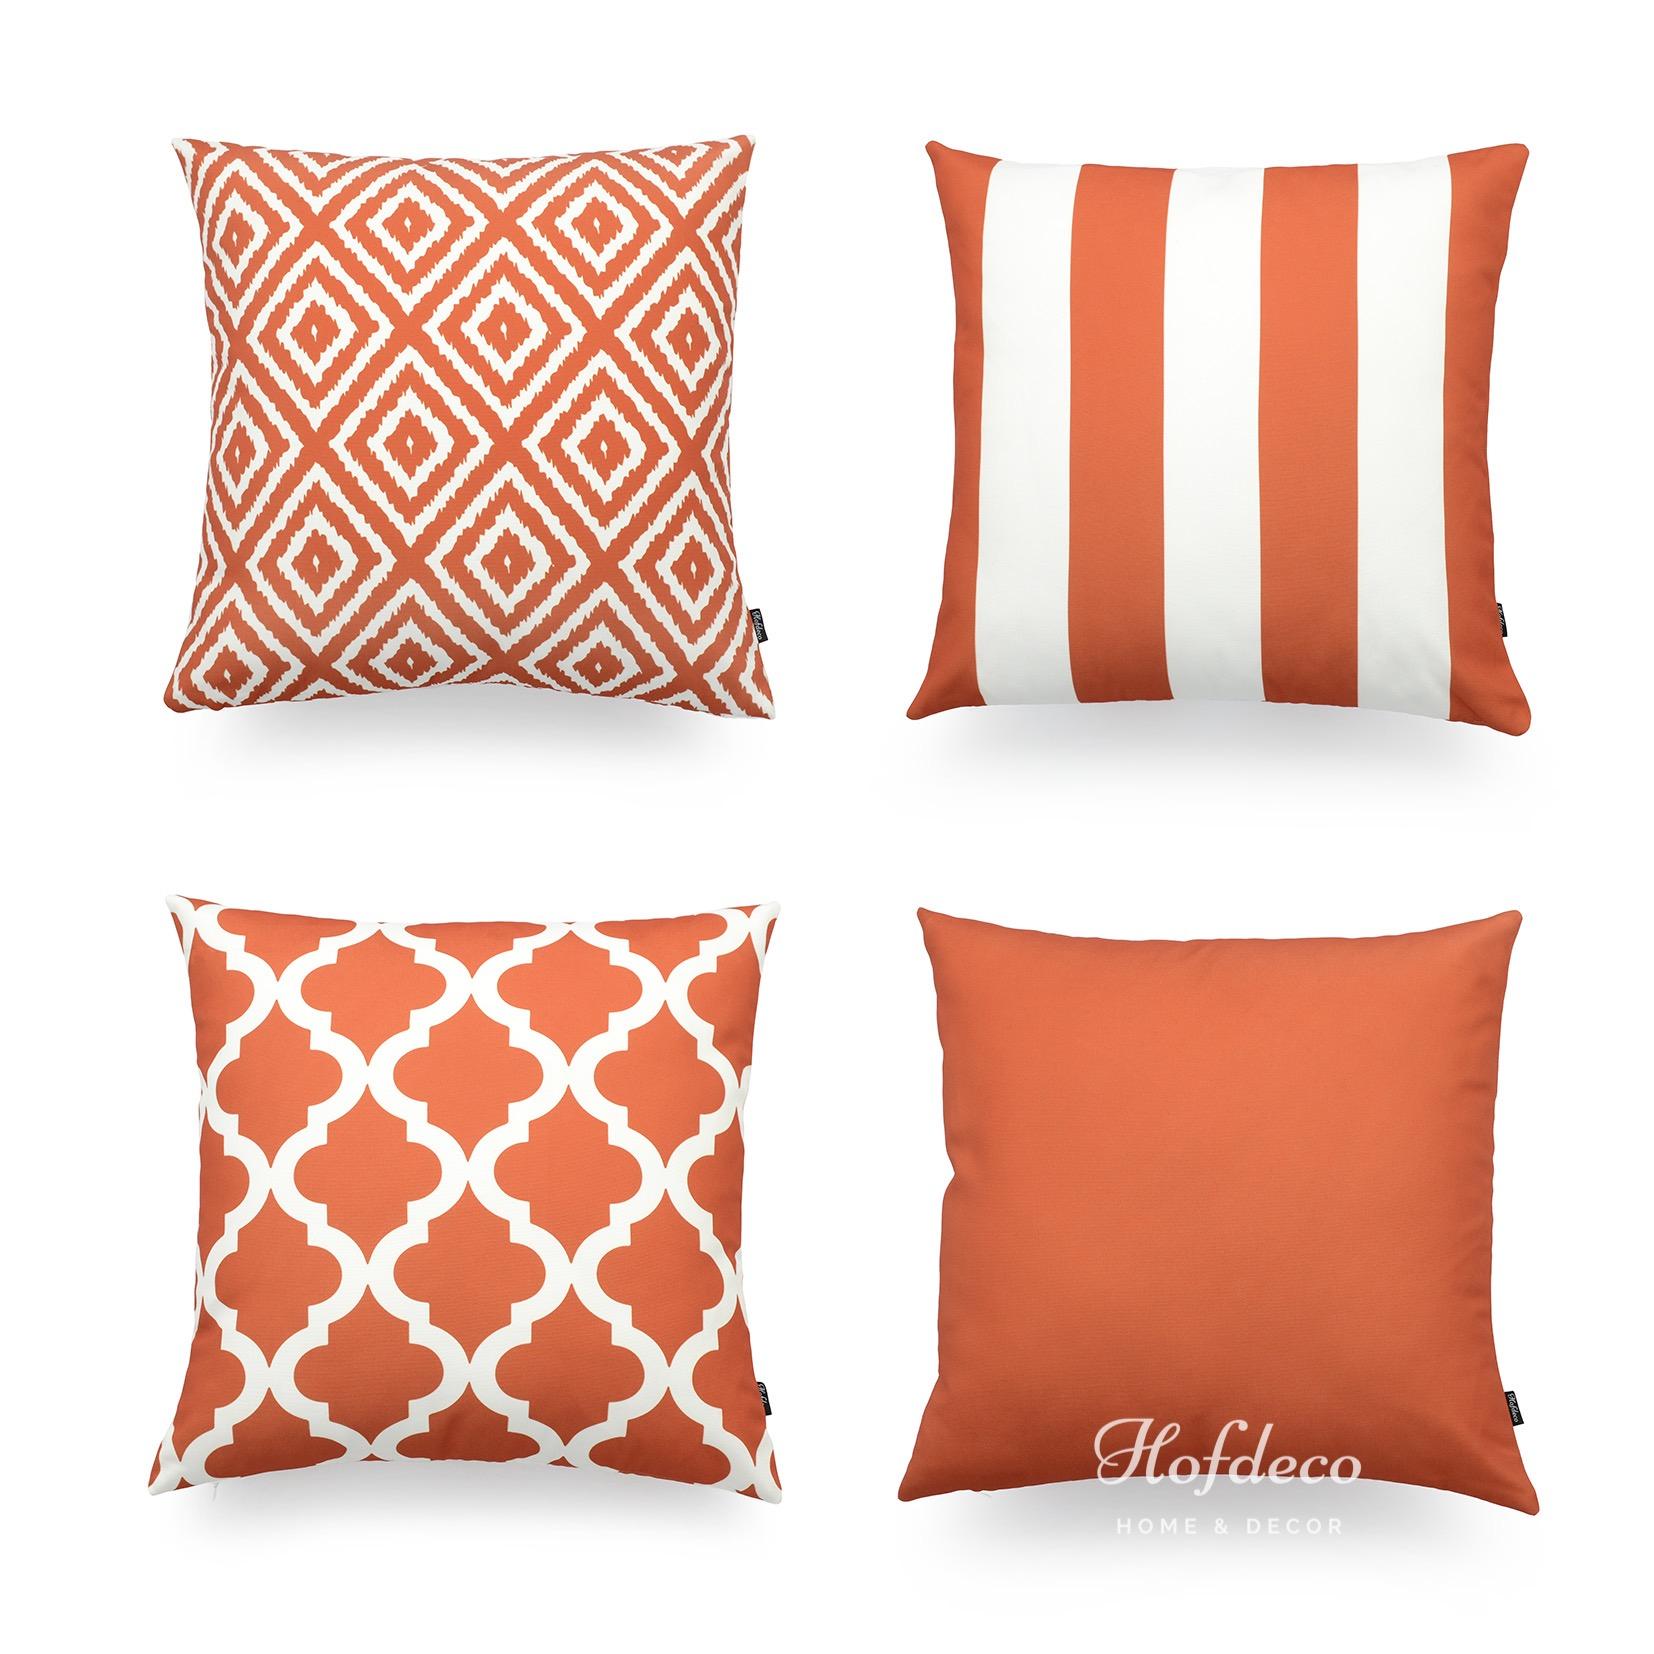 white company sofa throws french grey sofas hofdeco decorative cushion cover burnt orange geometric